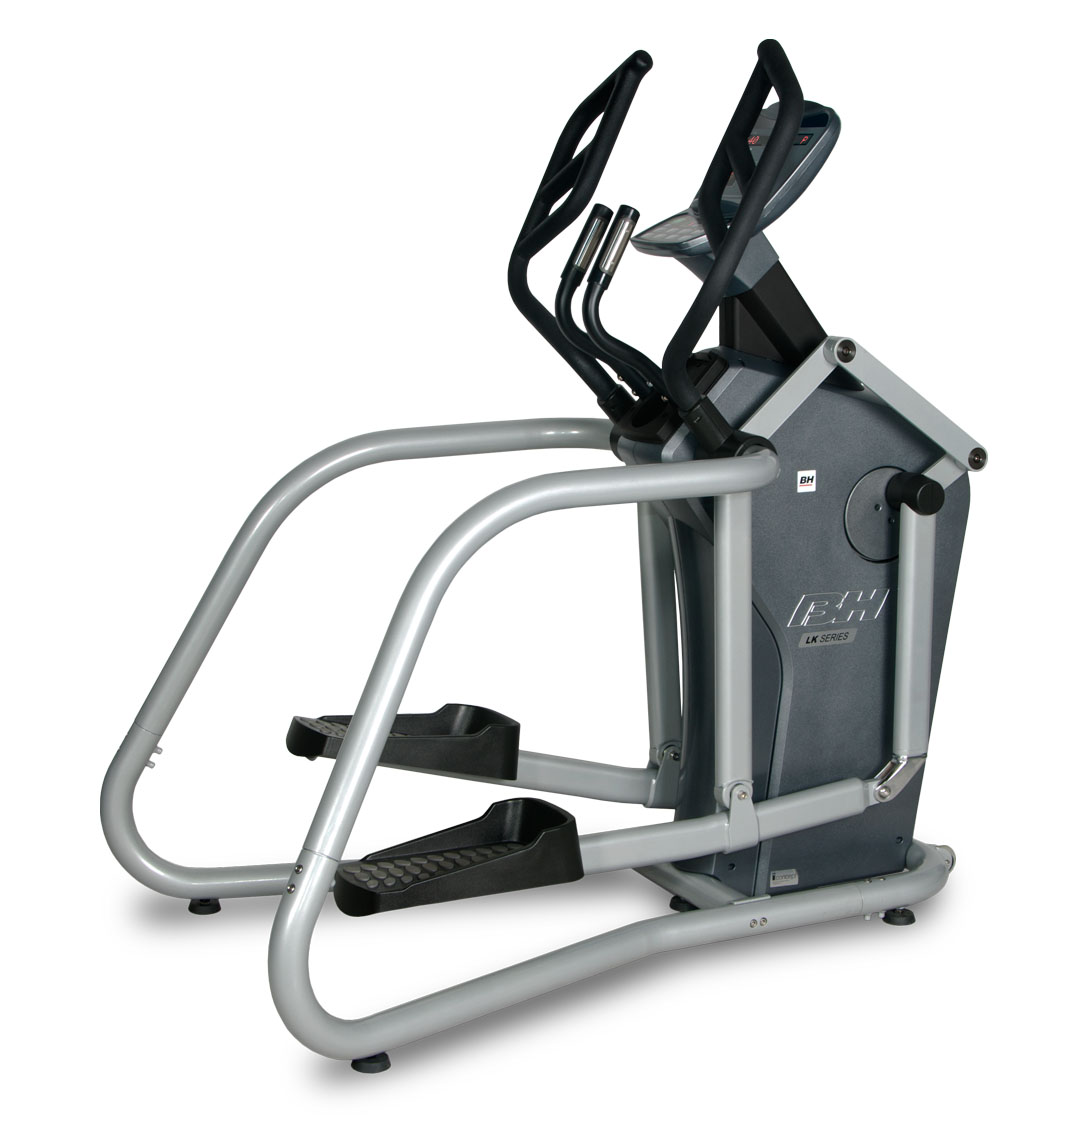 BH Fitness LK700X Elliptical